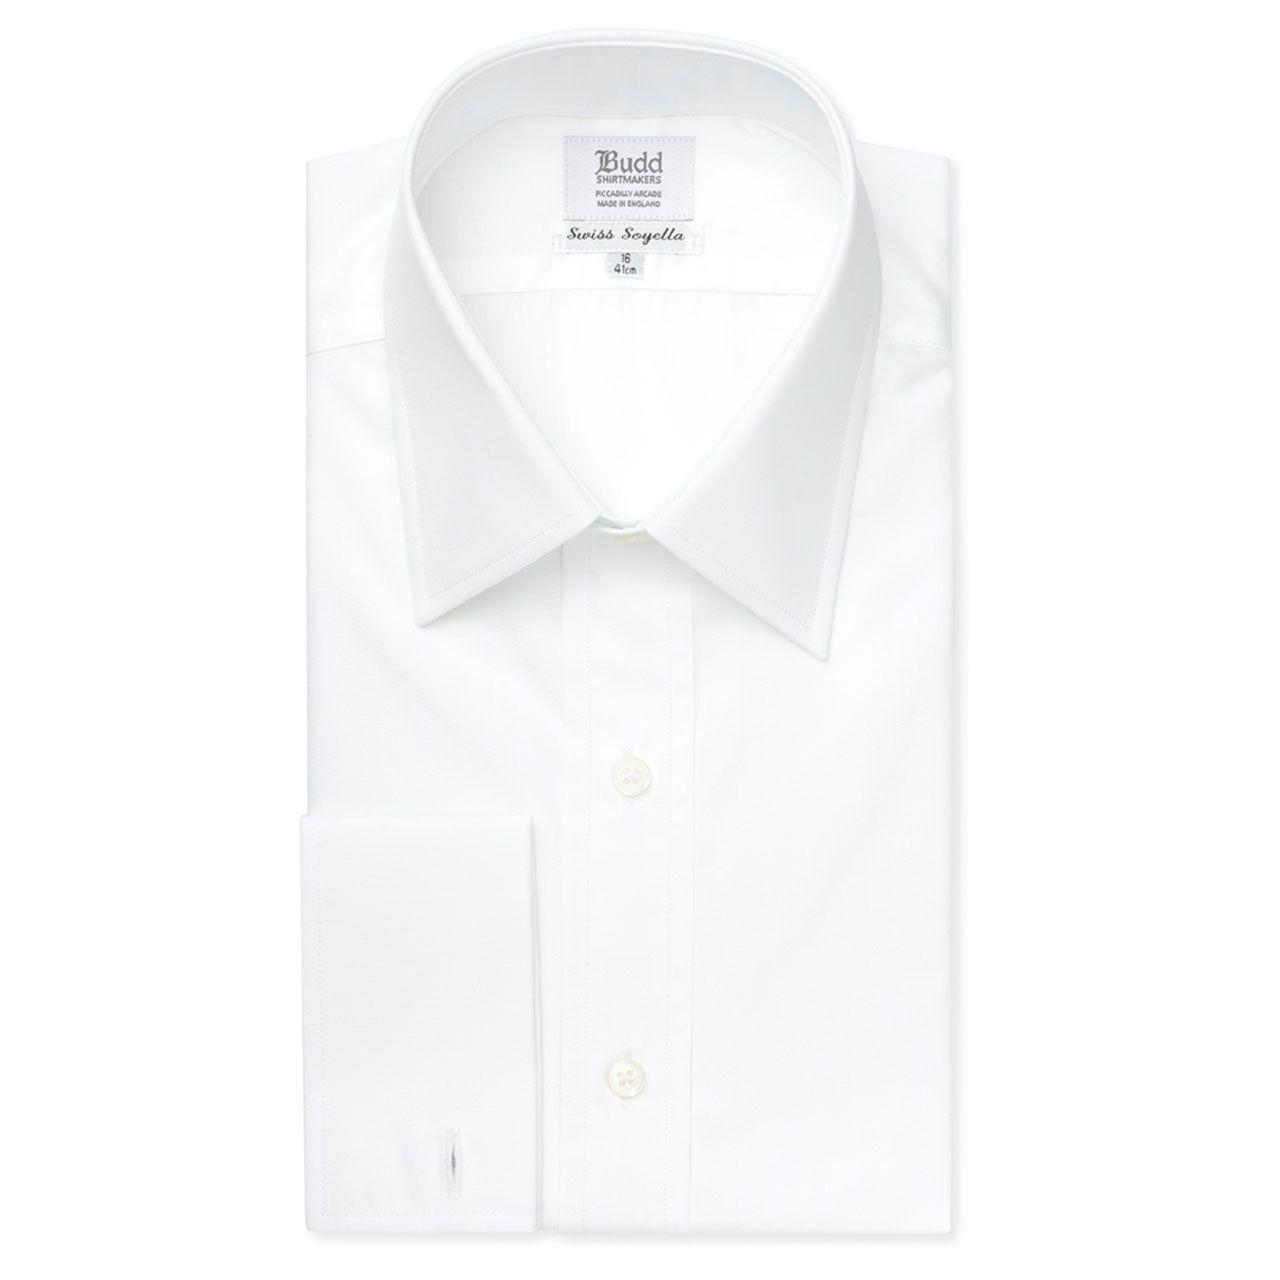 Classic Fit Plain Soyella Double Cuff Shirt in White